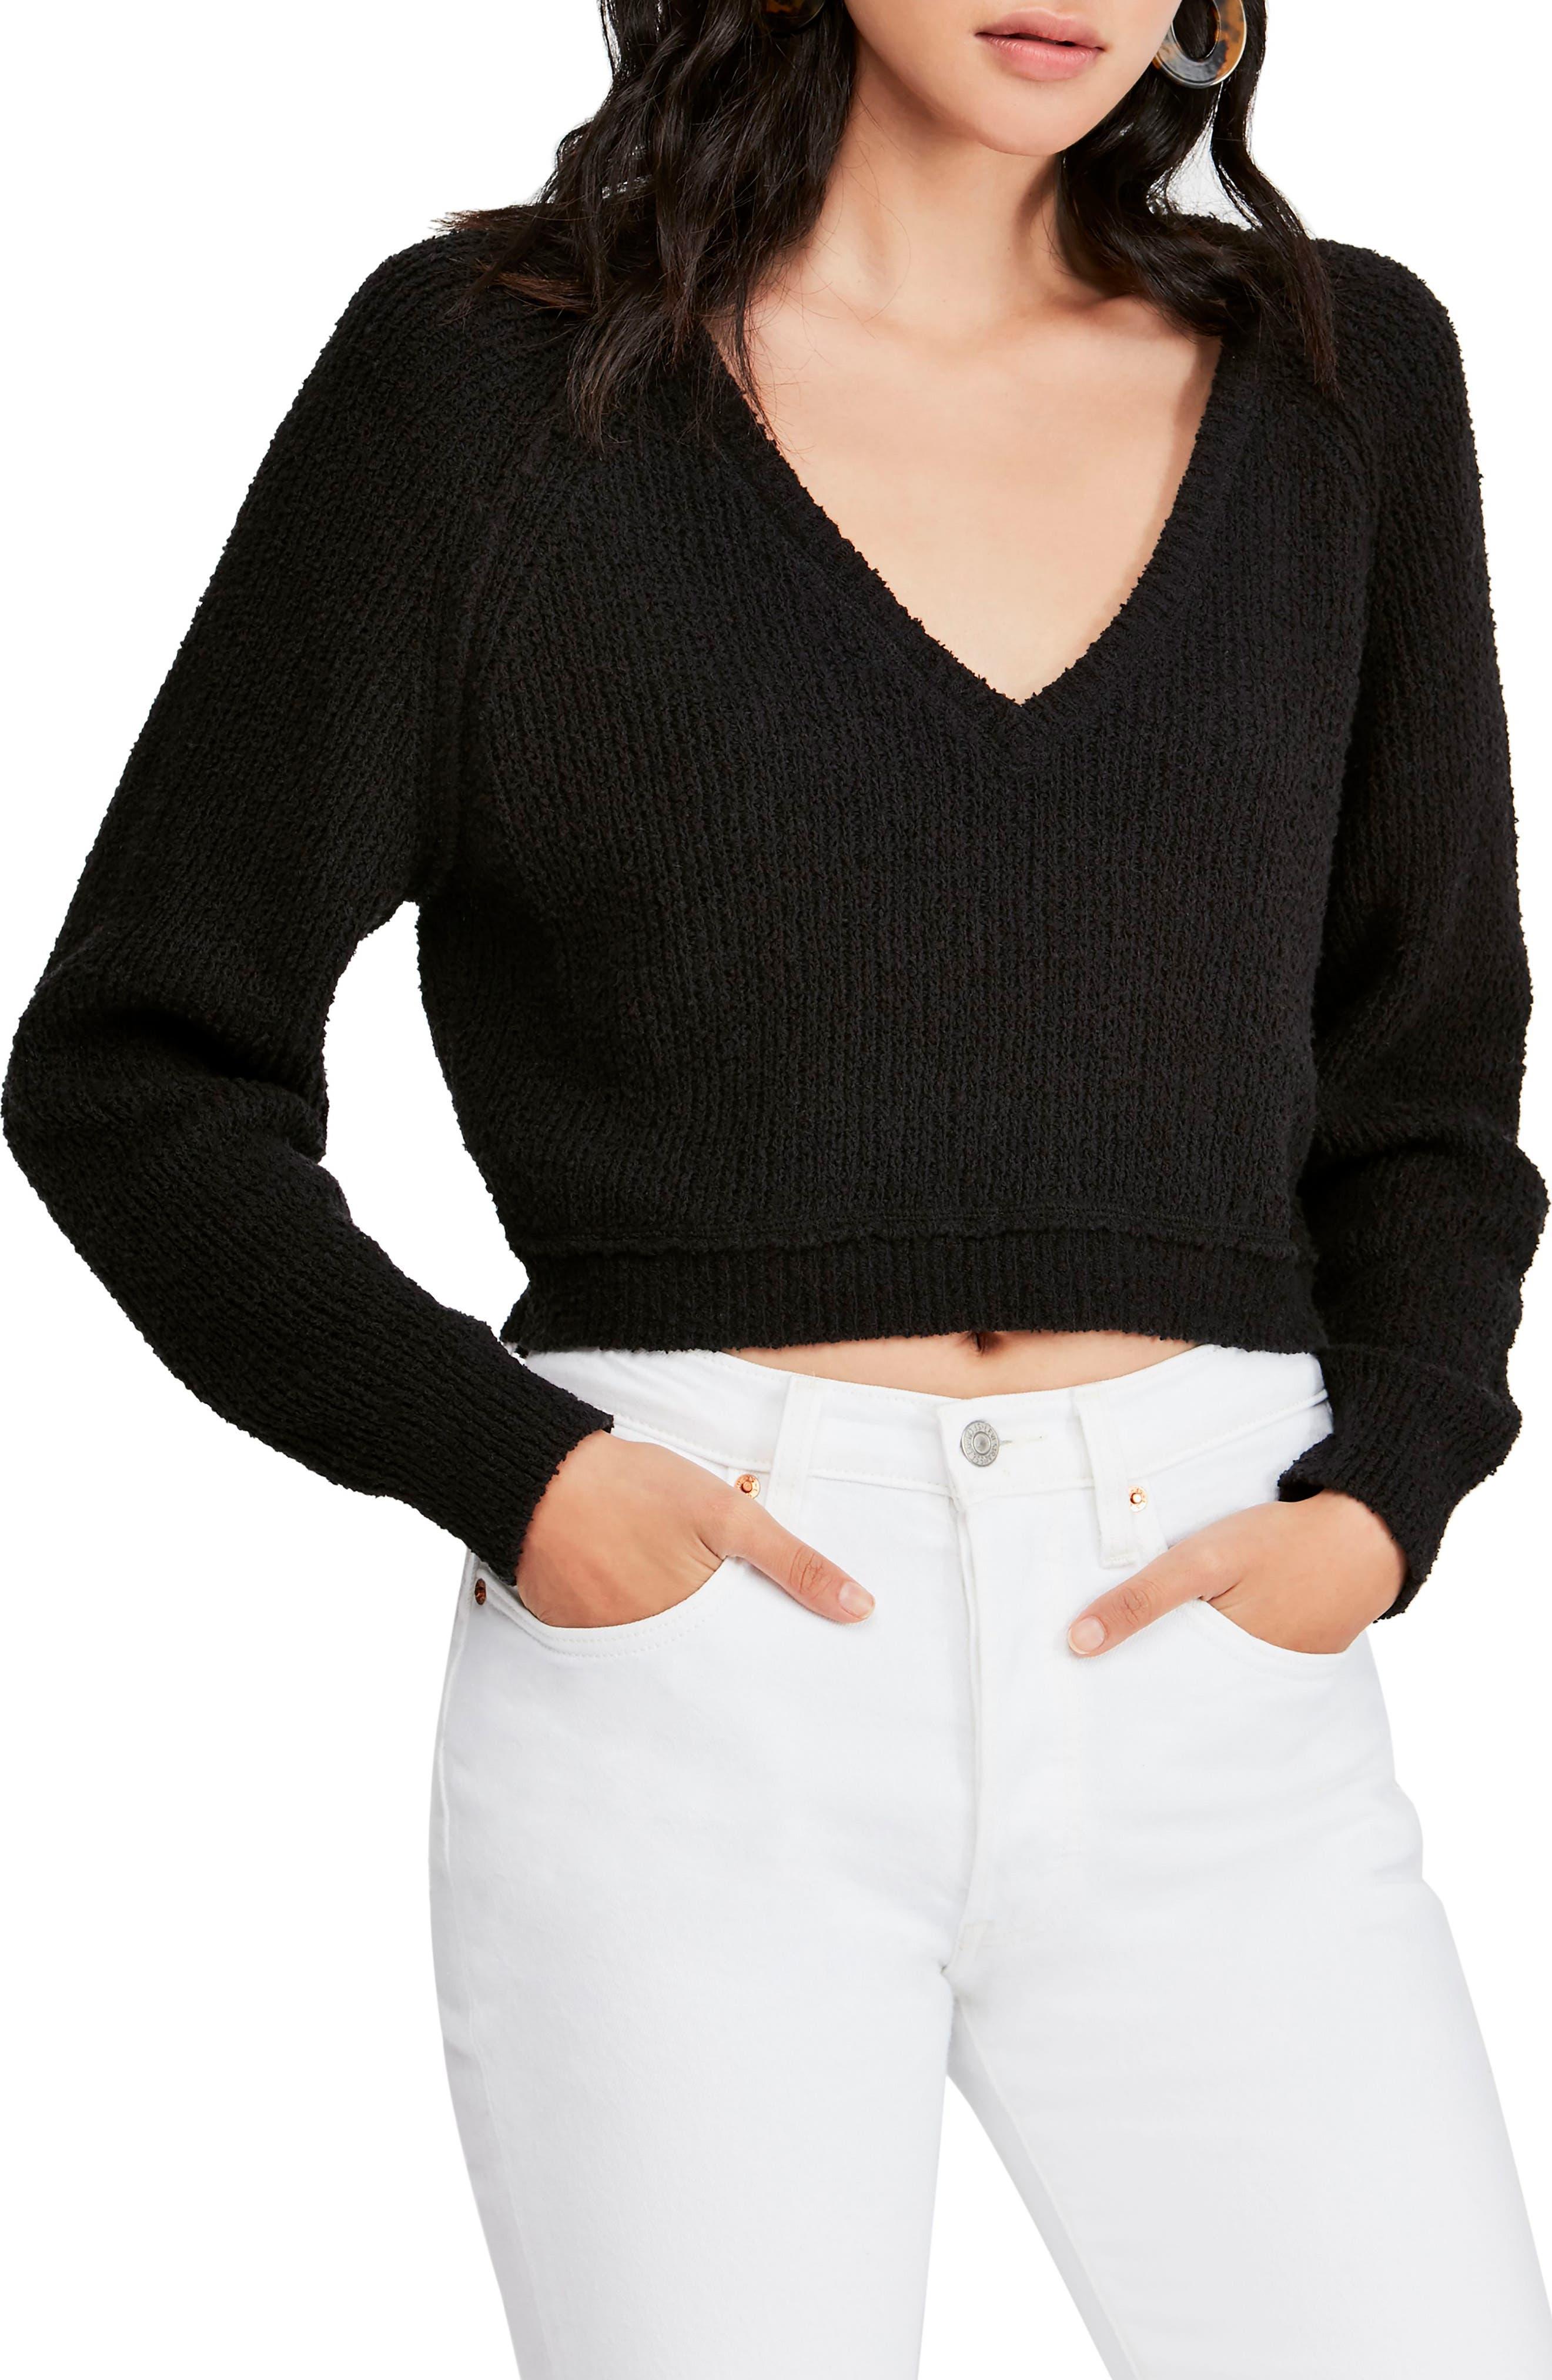 FREE PEOPLE V-Neck Sweater, Main, color, BLACK